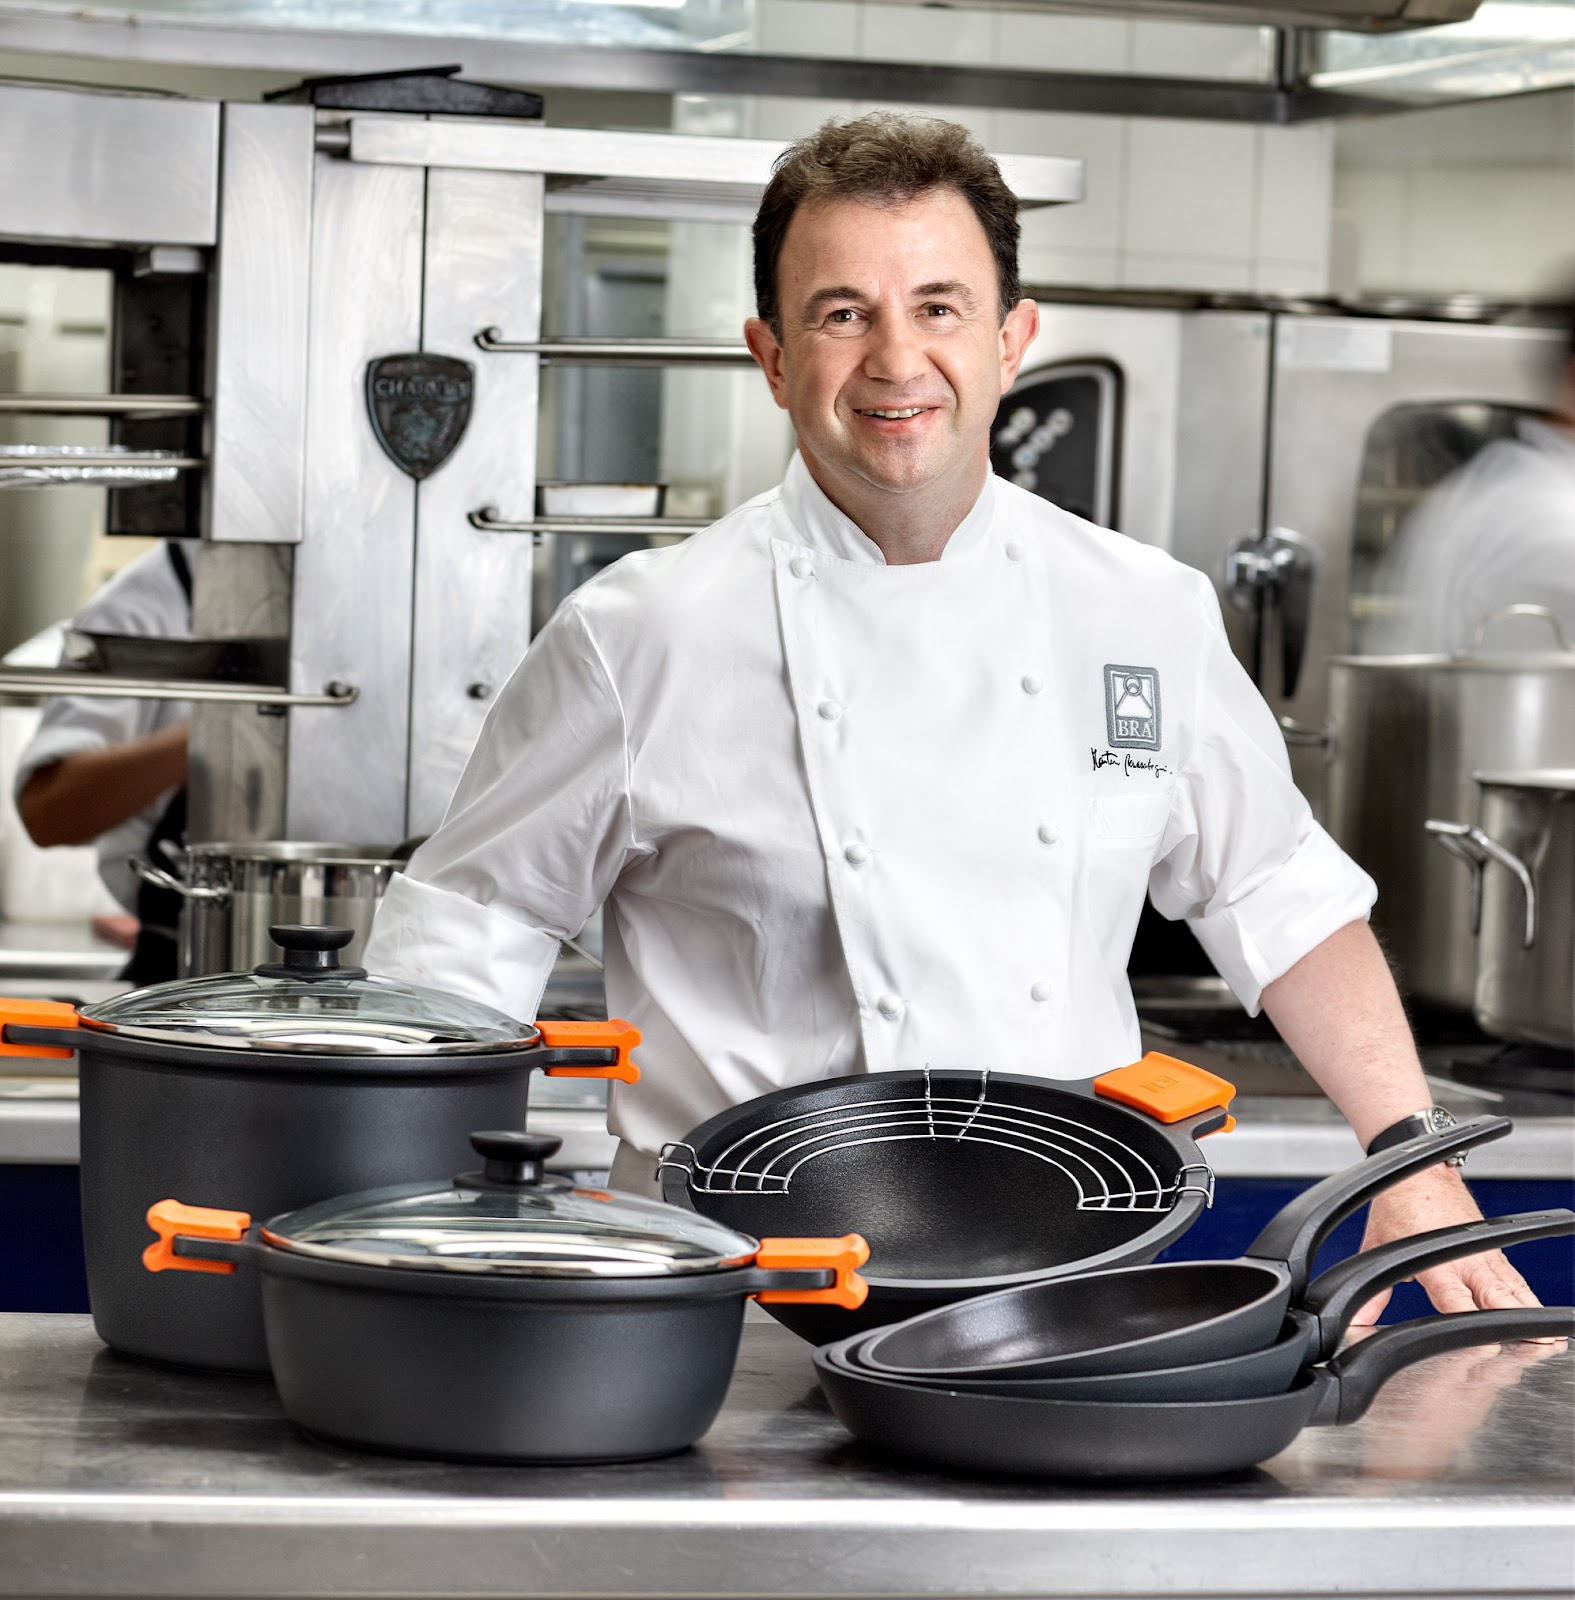 Martin Berasategui Cocina Con Bra Cocinaconbra Com